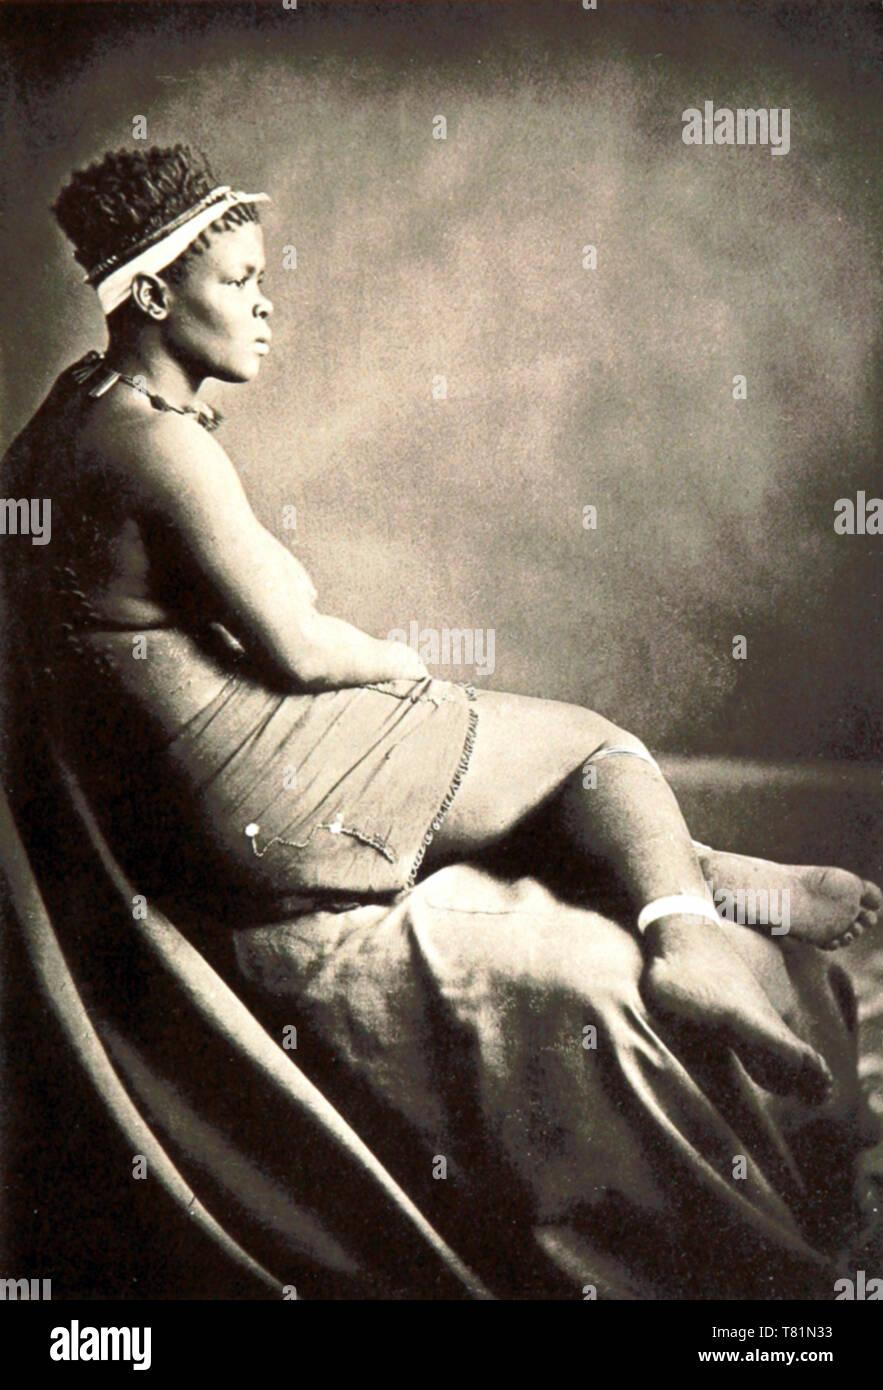 Zulu Girls Stock Photos & Zulu Girls Stock Images - Alamy